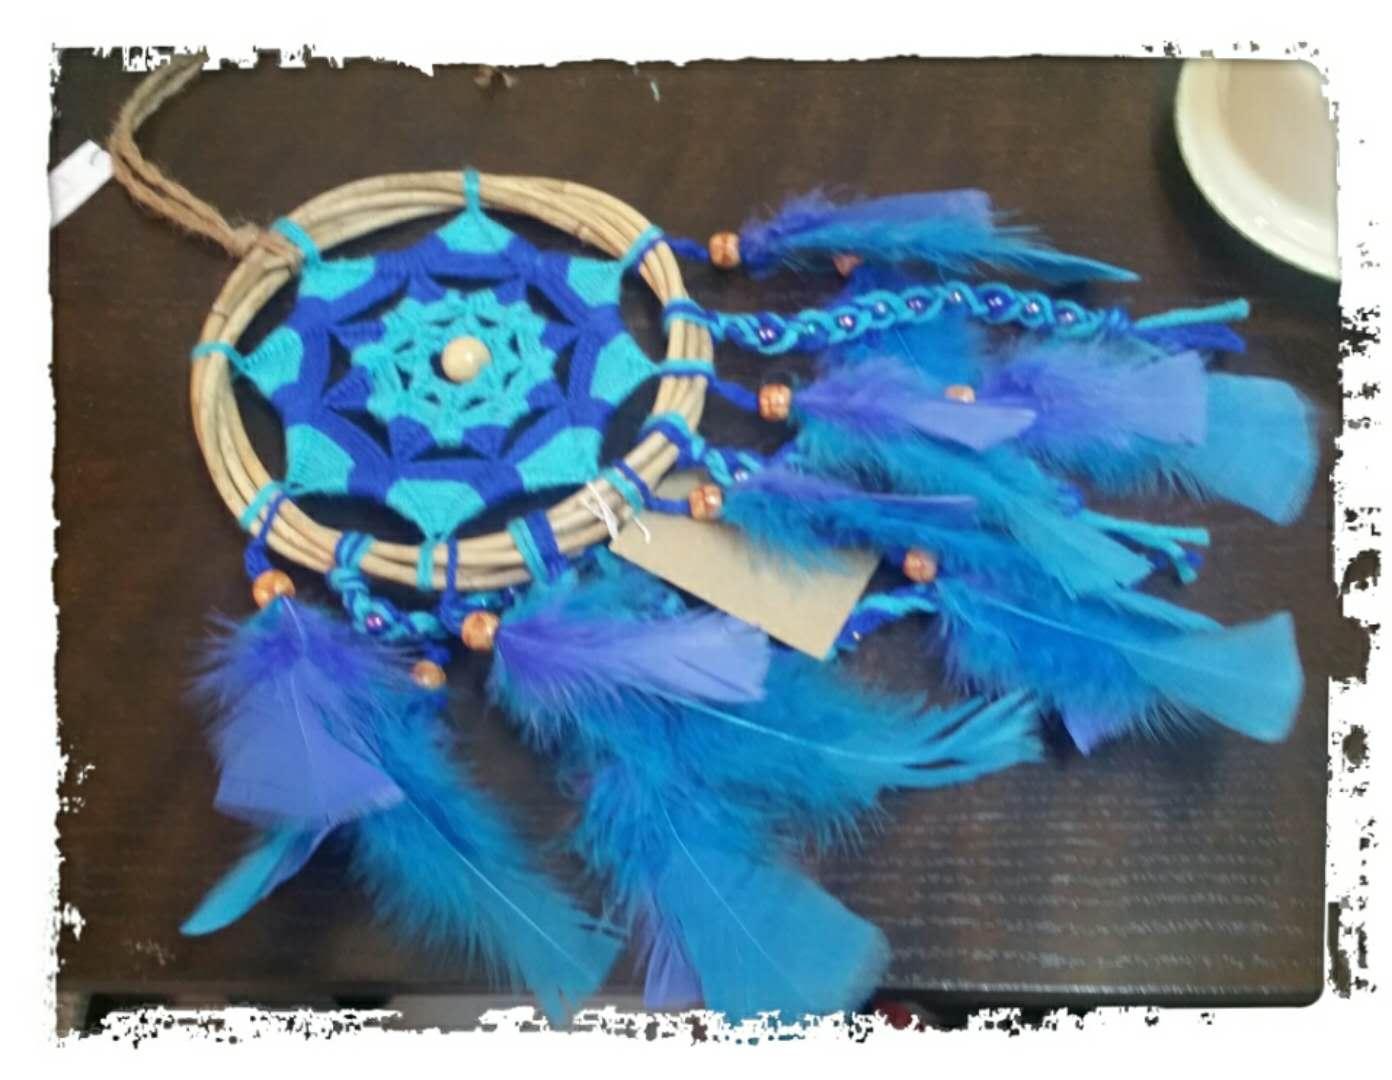 authentic Handmade Handicrafts